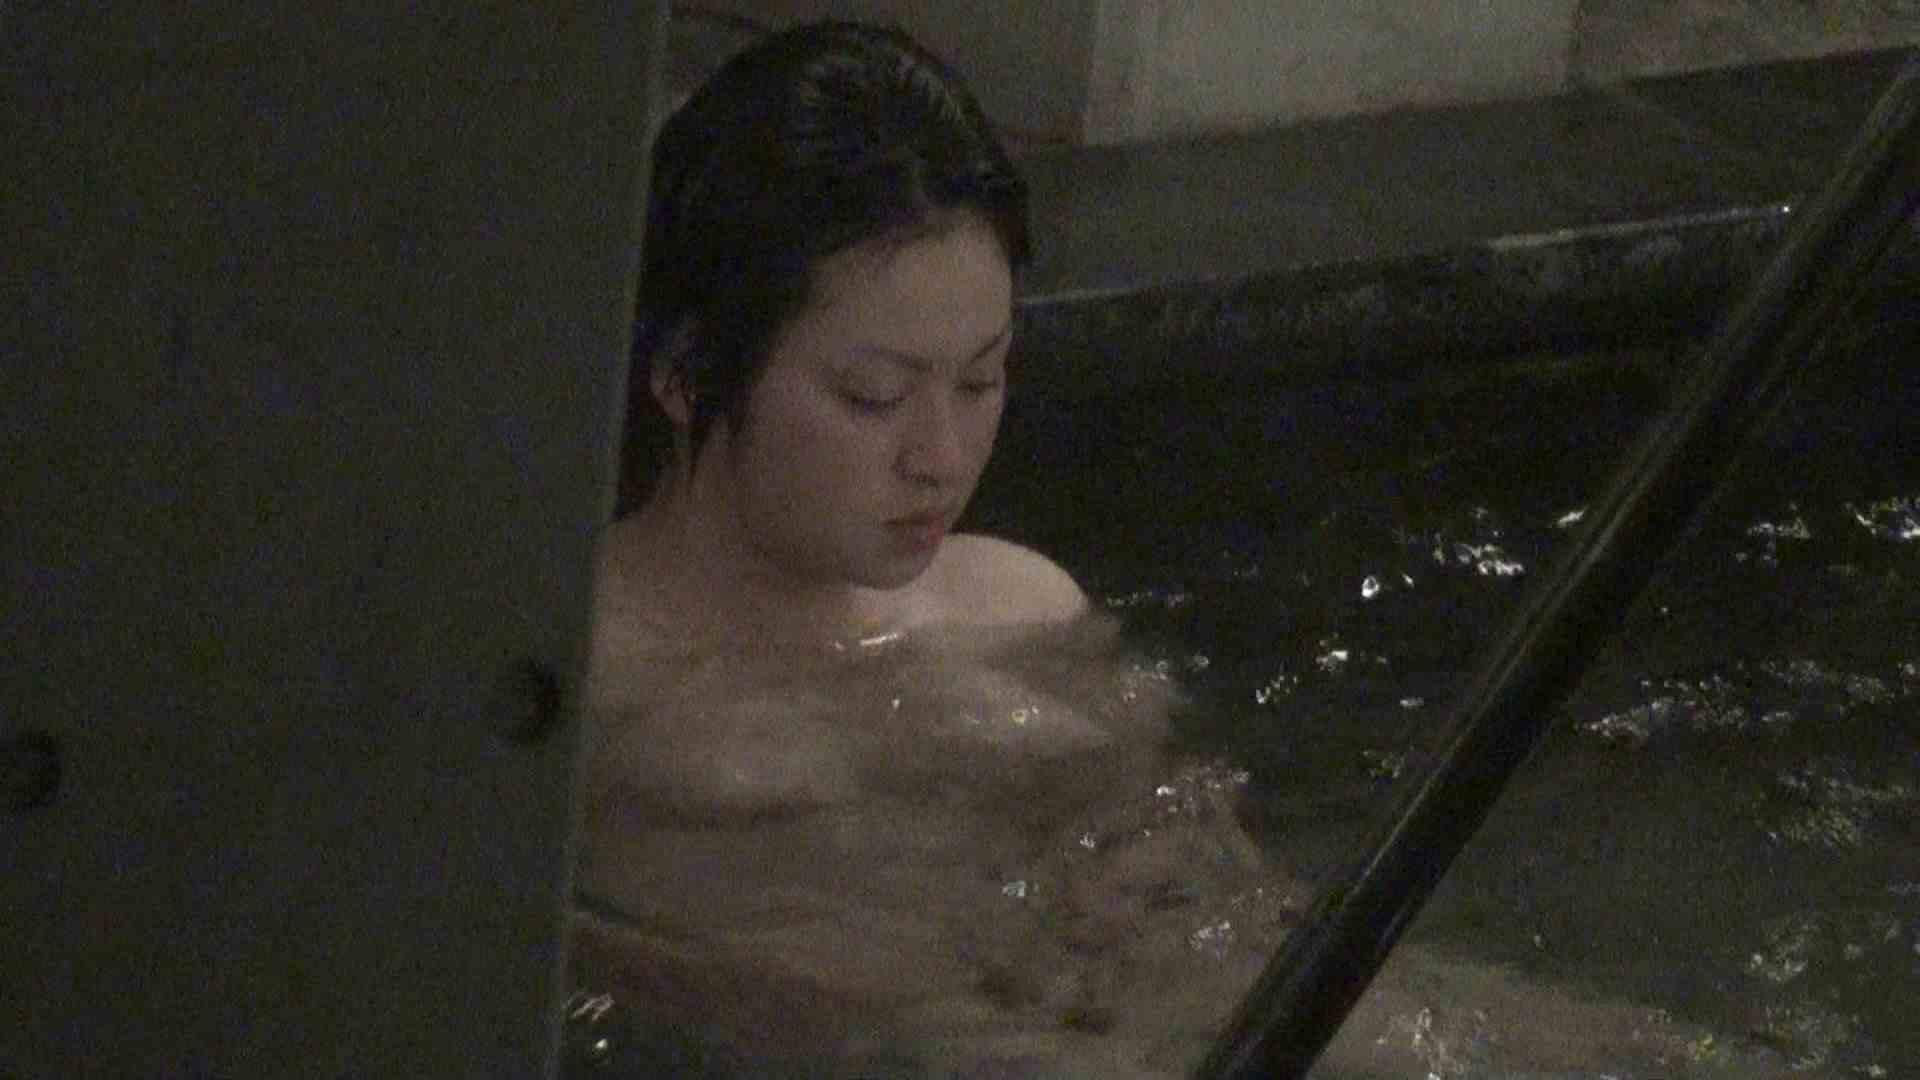 Aquaな露天風呂Vol.338 露天 AV動画キャプチャ 101pic 94